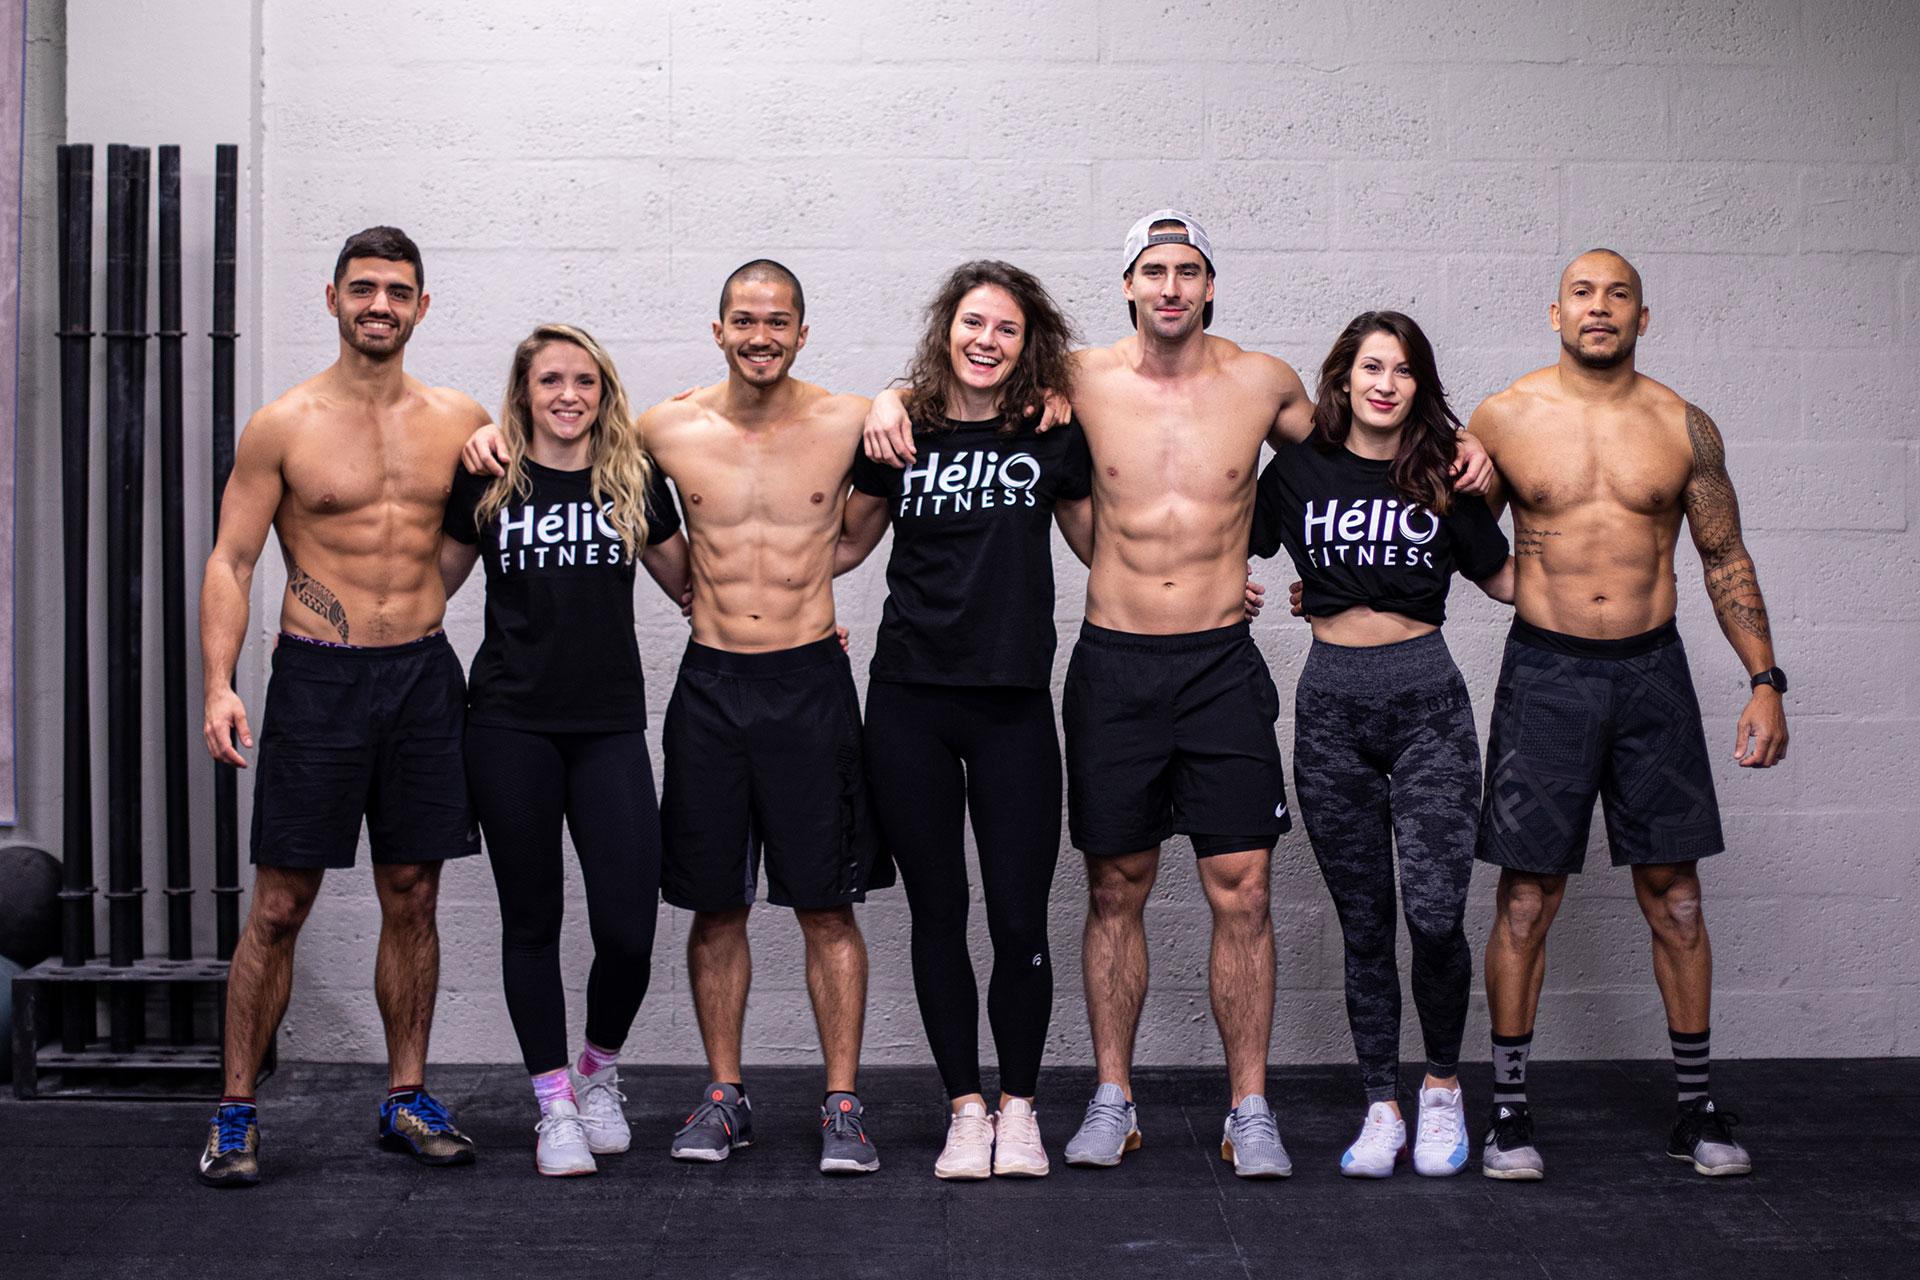 L'équipe Hélio Fitness